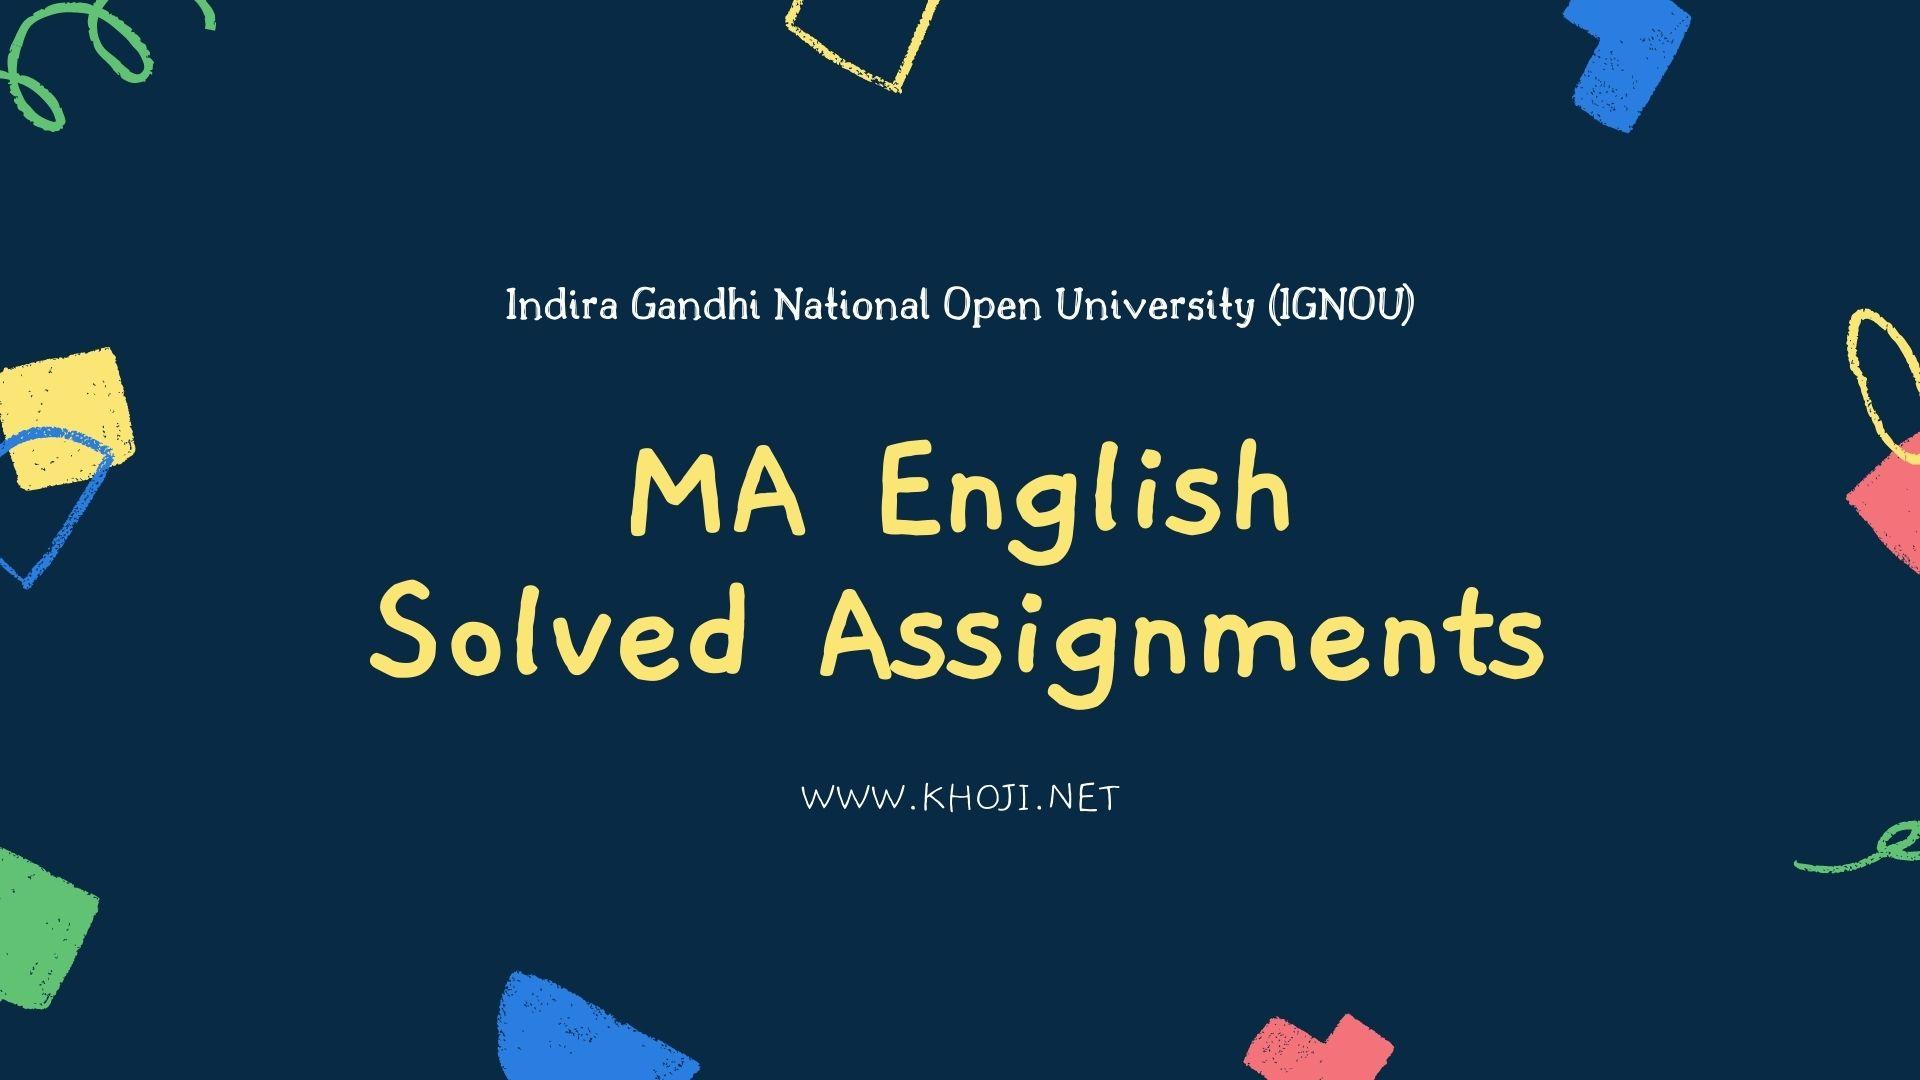 IGNOU MA English Solved Assignments KHOJINET